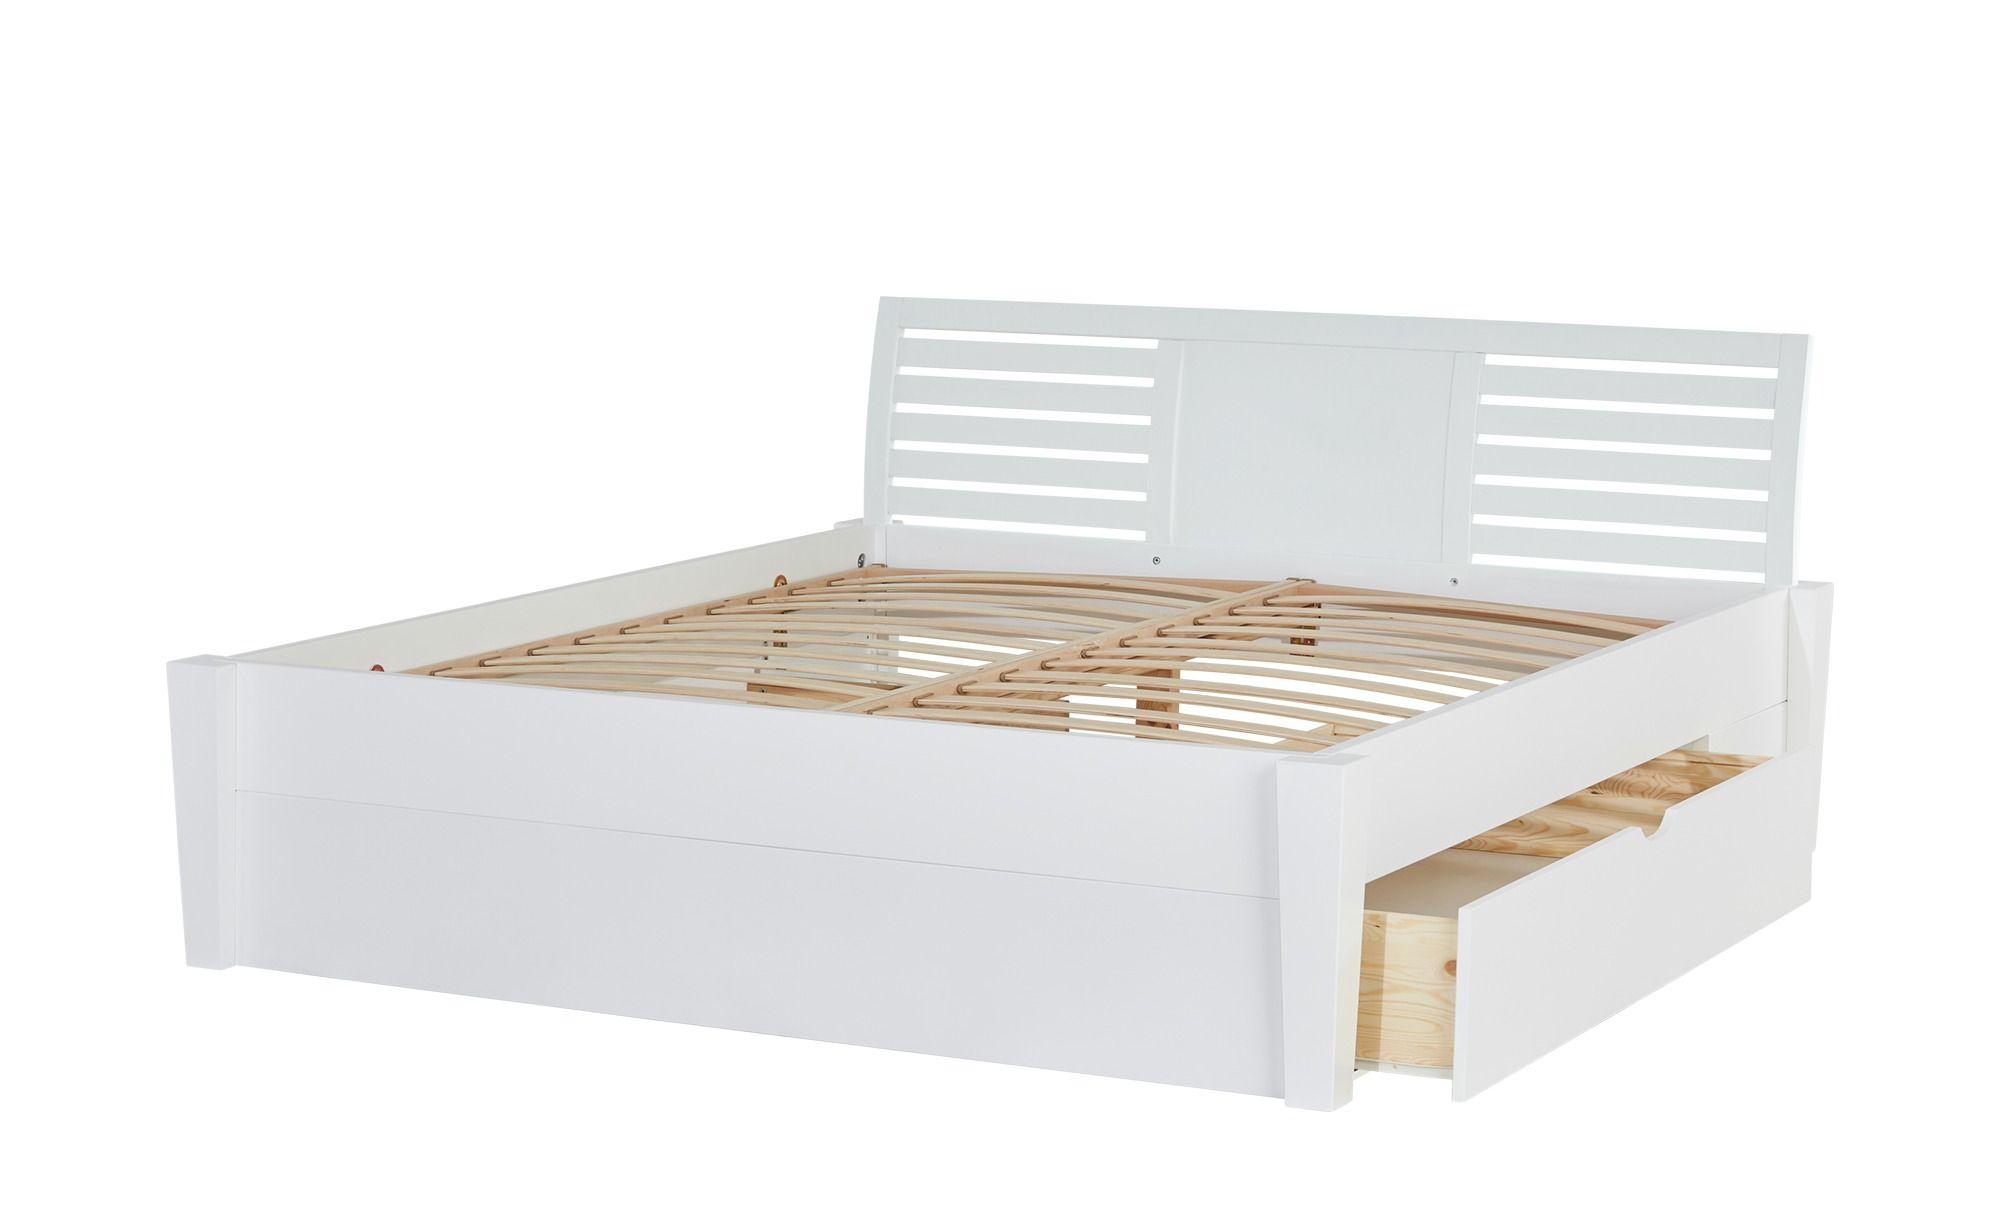 Massivholz Bettgestell Mit Bettkasten Timber Bettgestell Bett